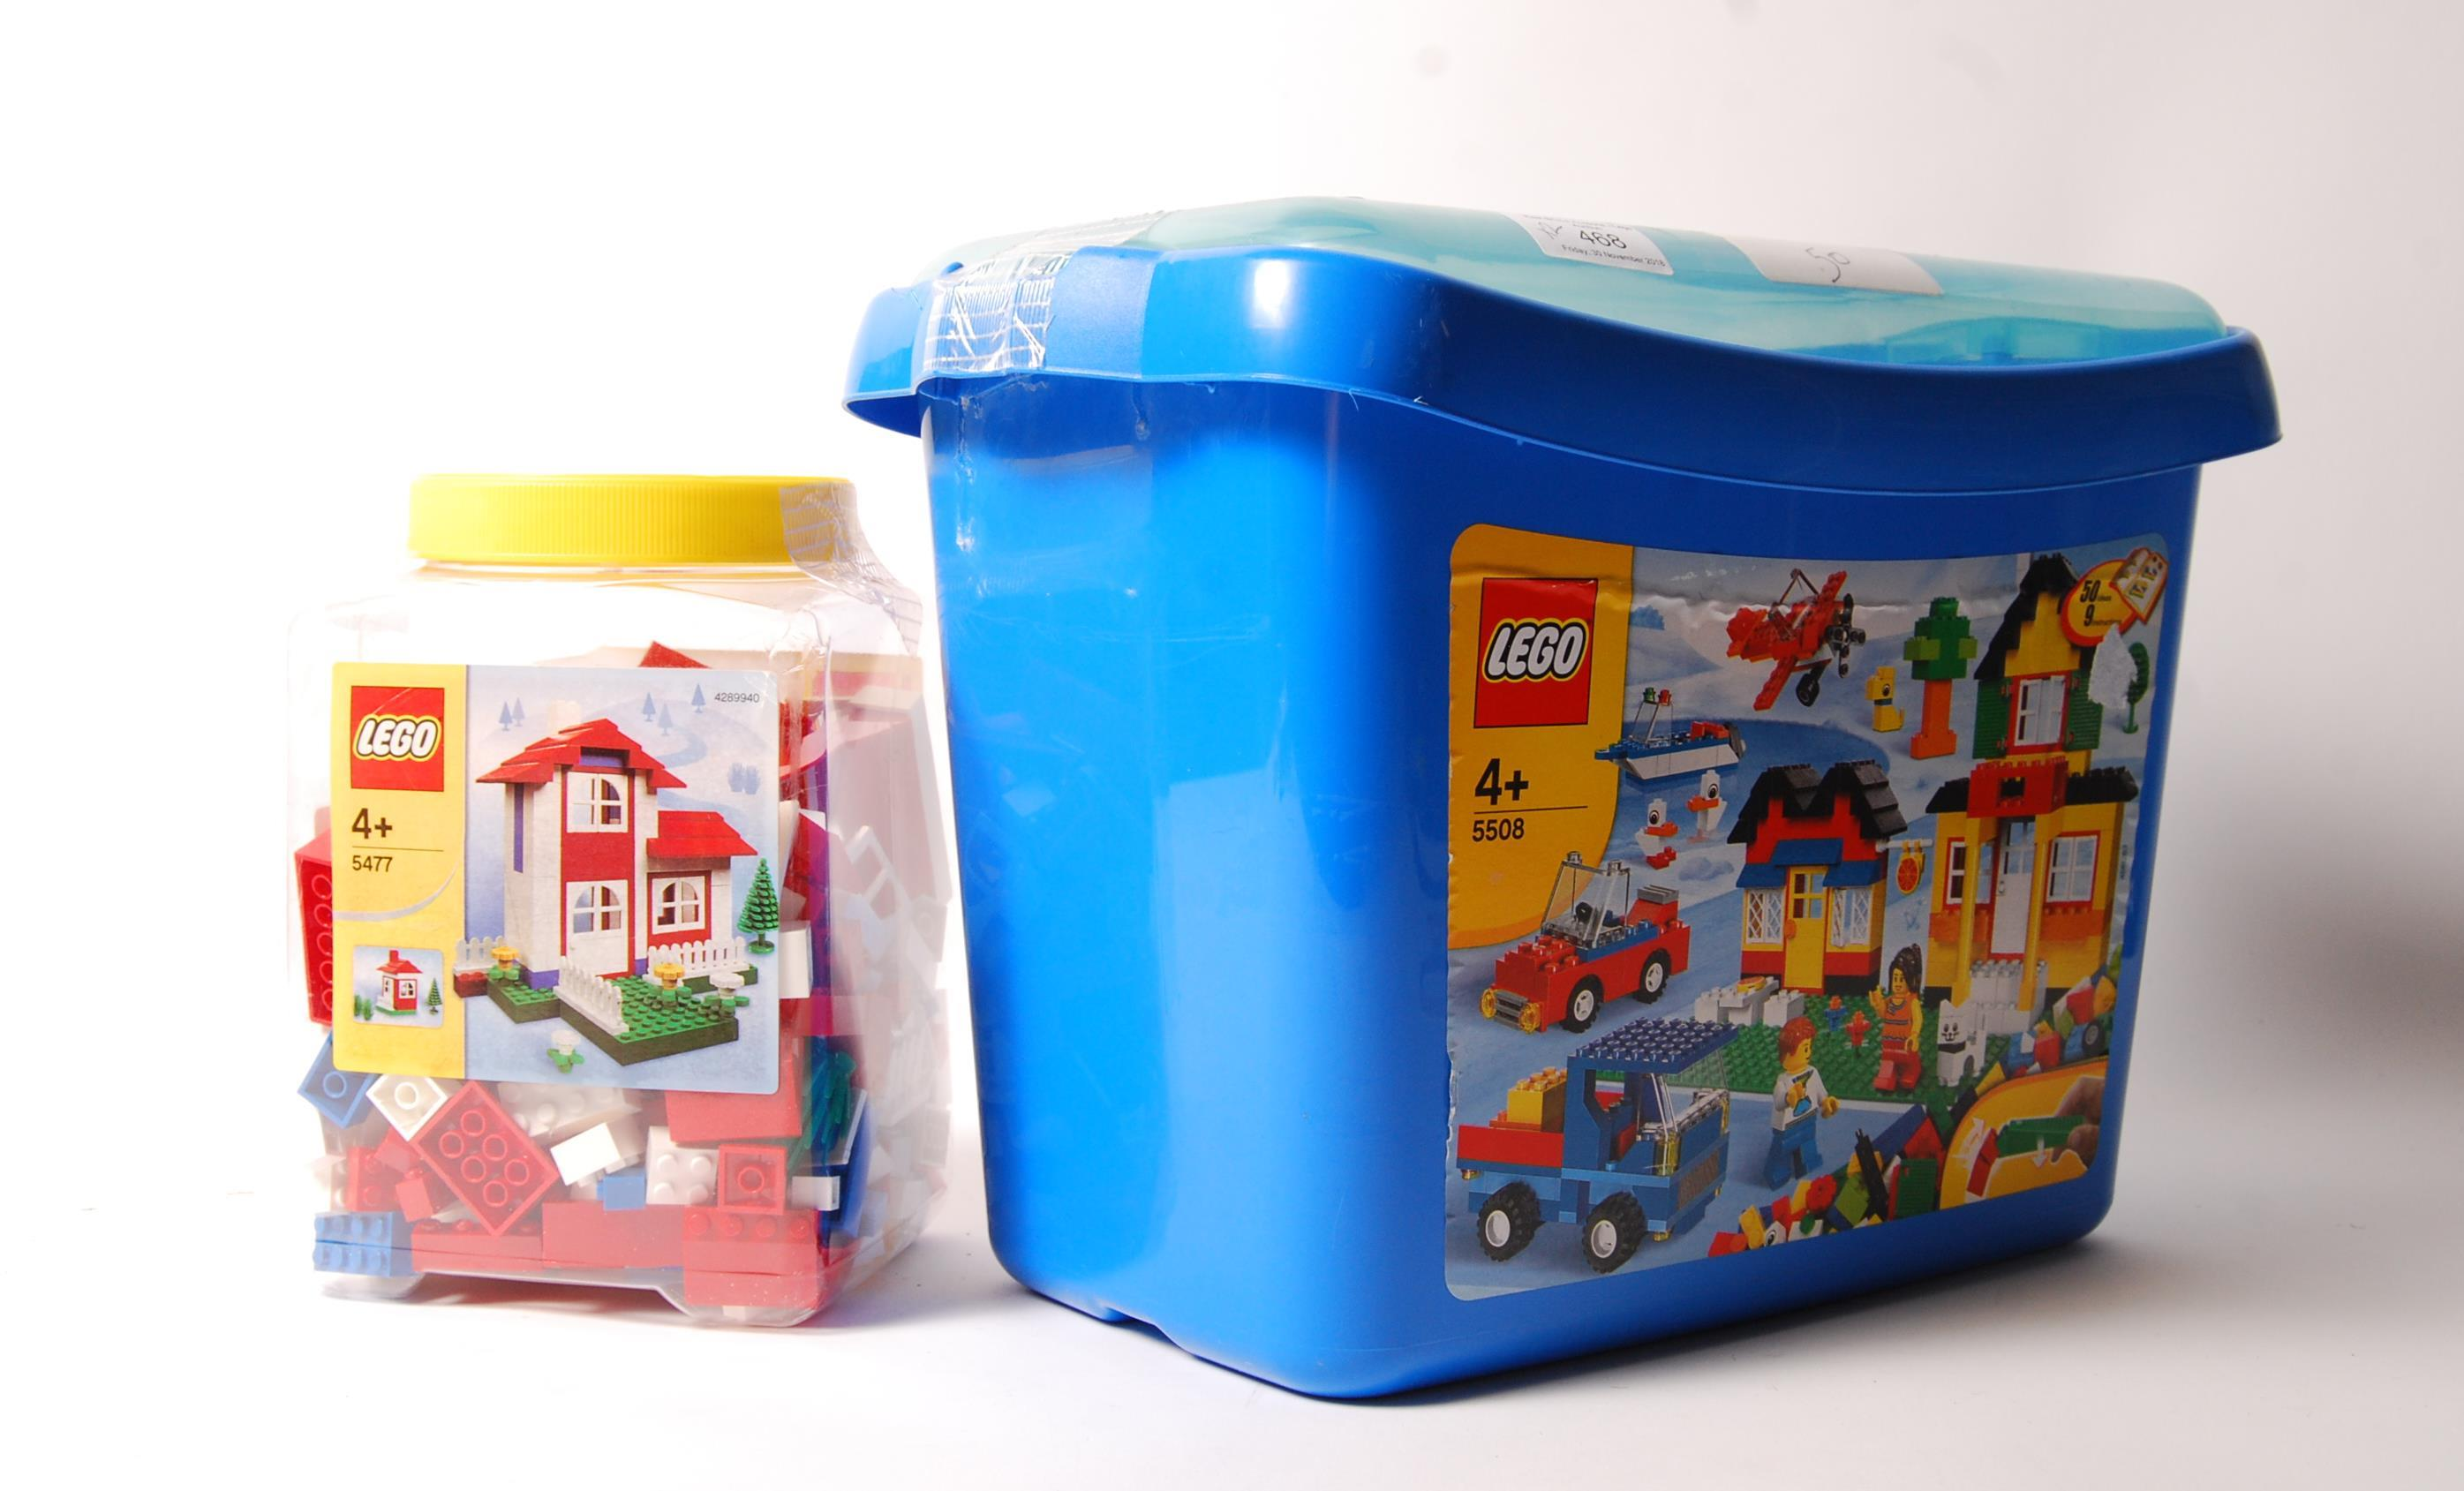 LEGO CREATOR SERIES NO. 5477 & BRICKS & MORE 5508